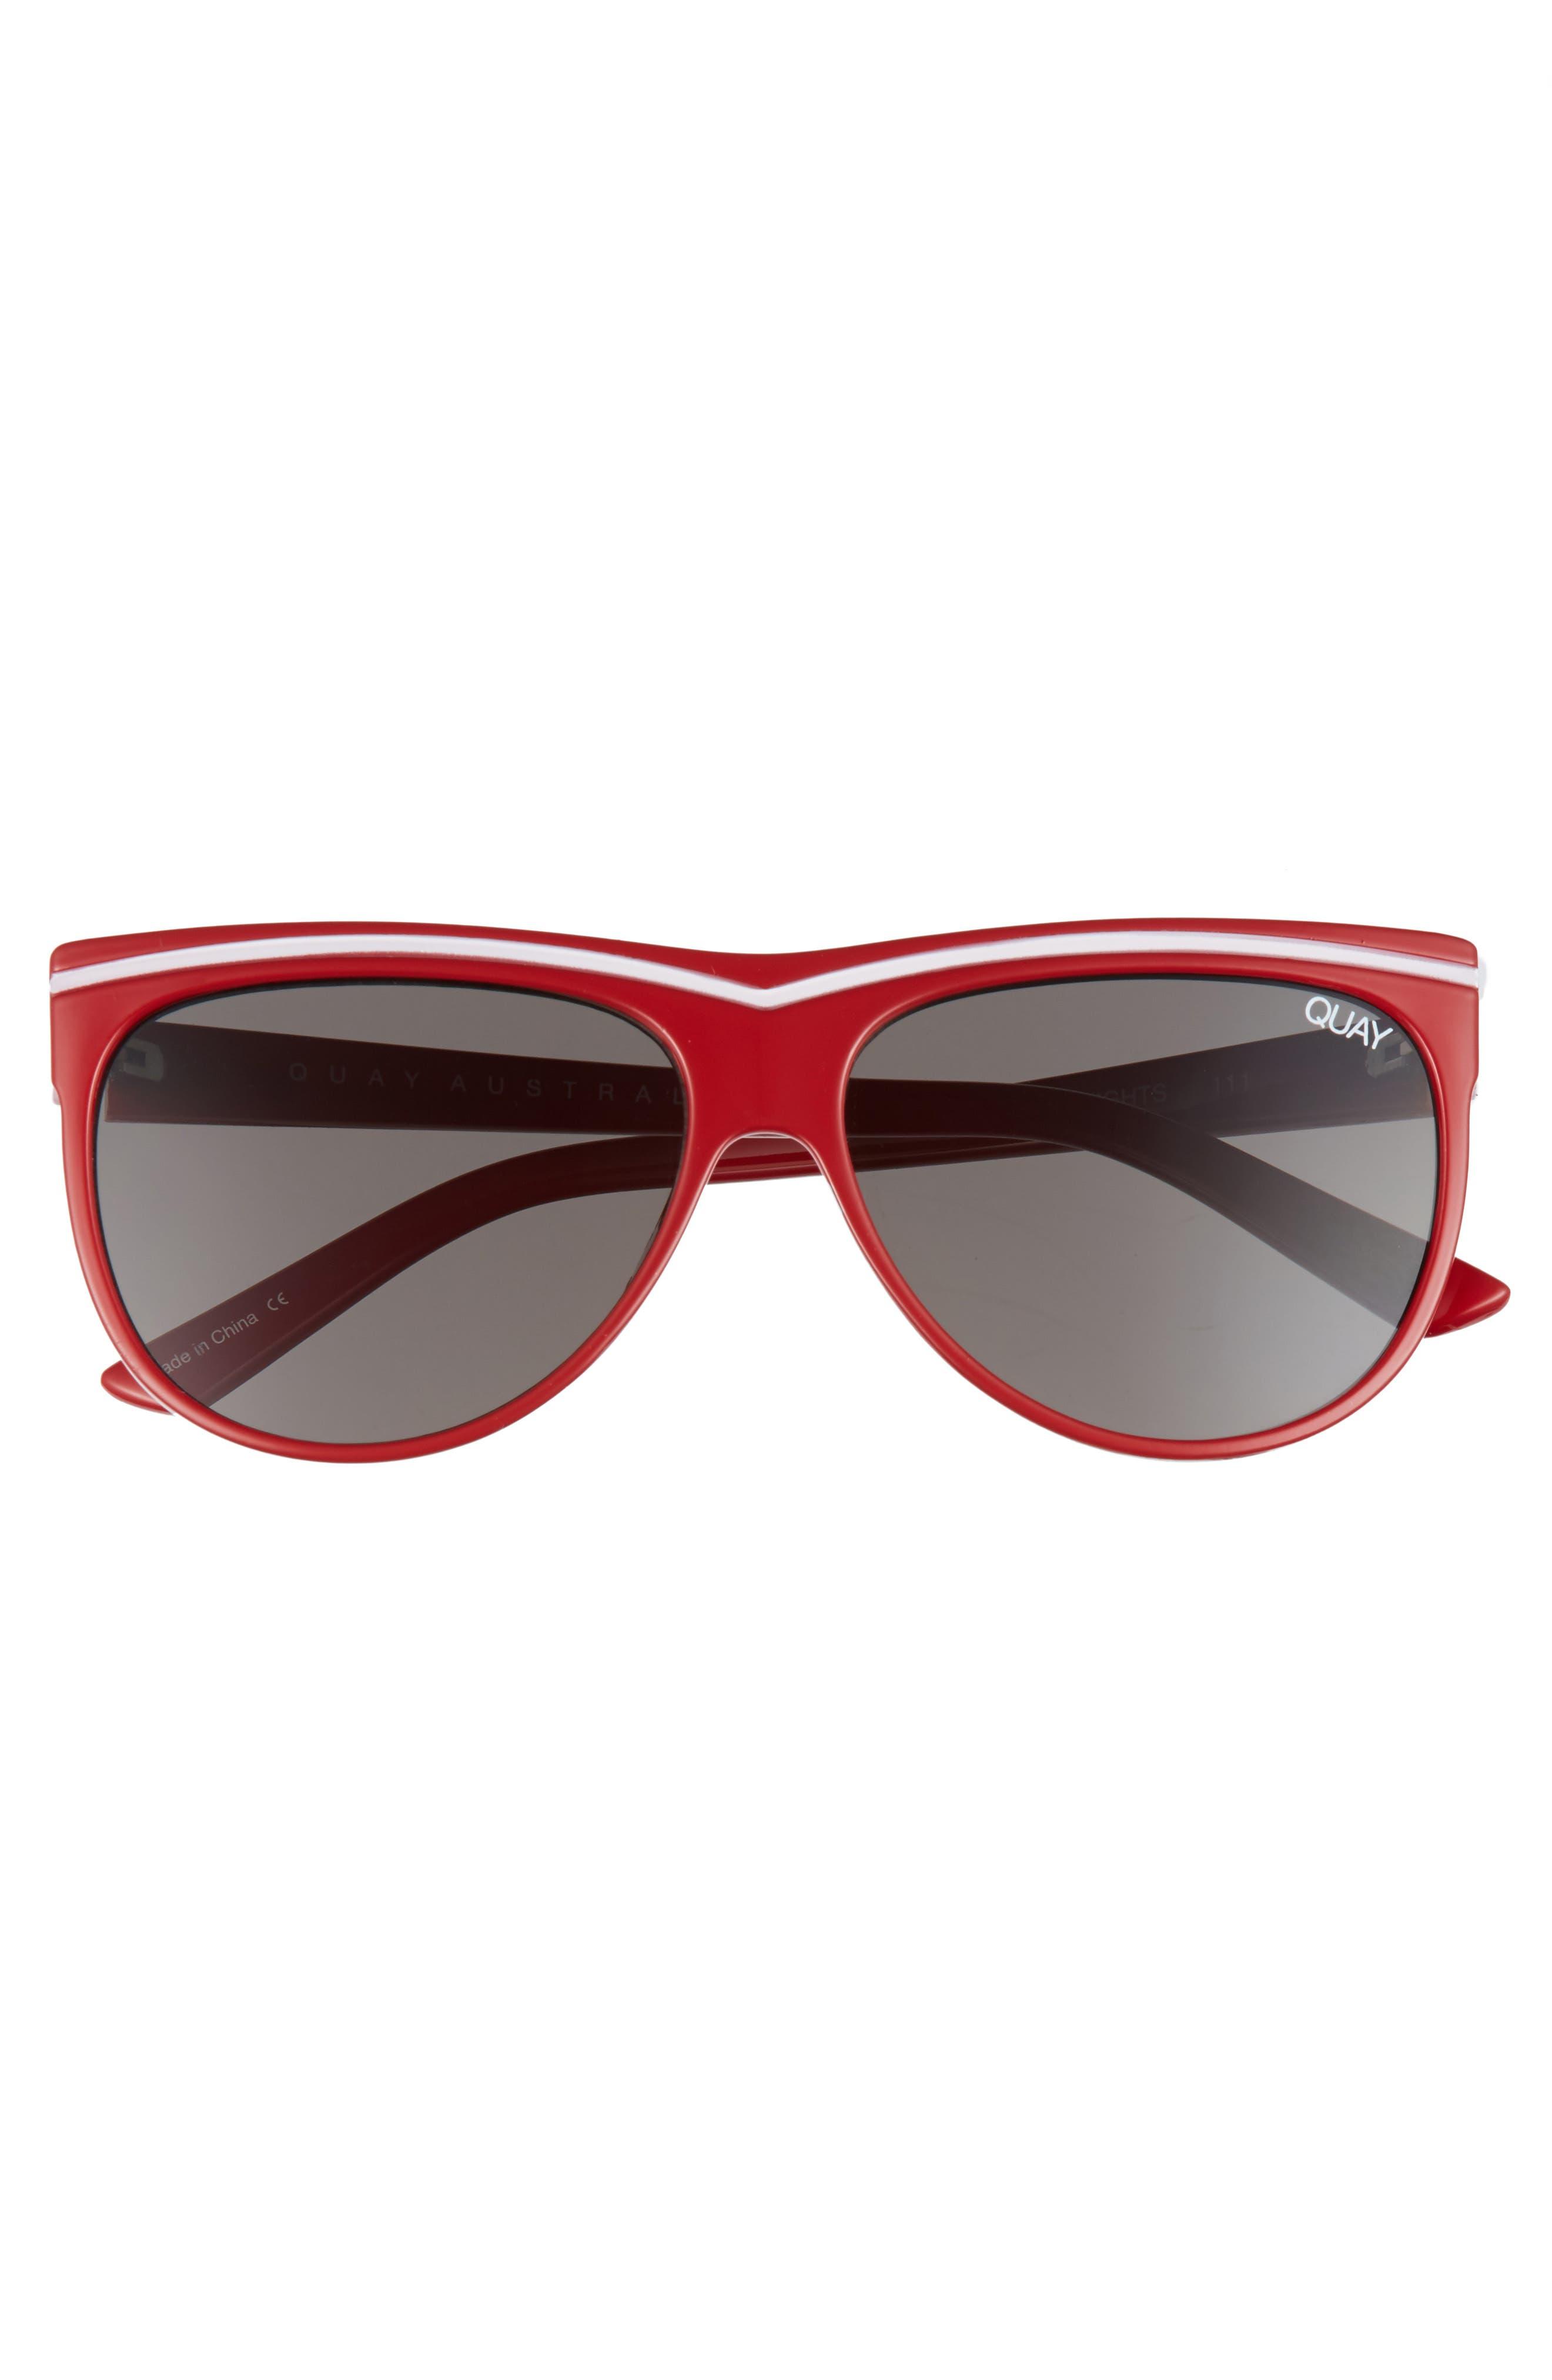 Hollywood Nights 62mm Sunglasses,                             Alternate thumbnail 9, color,